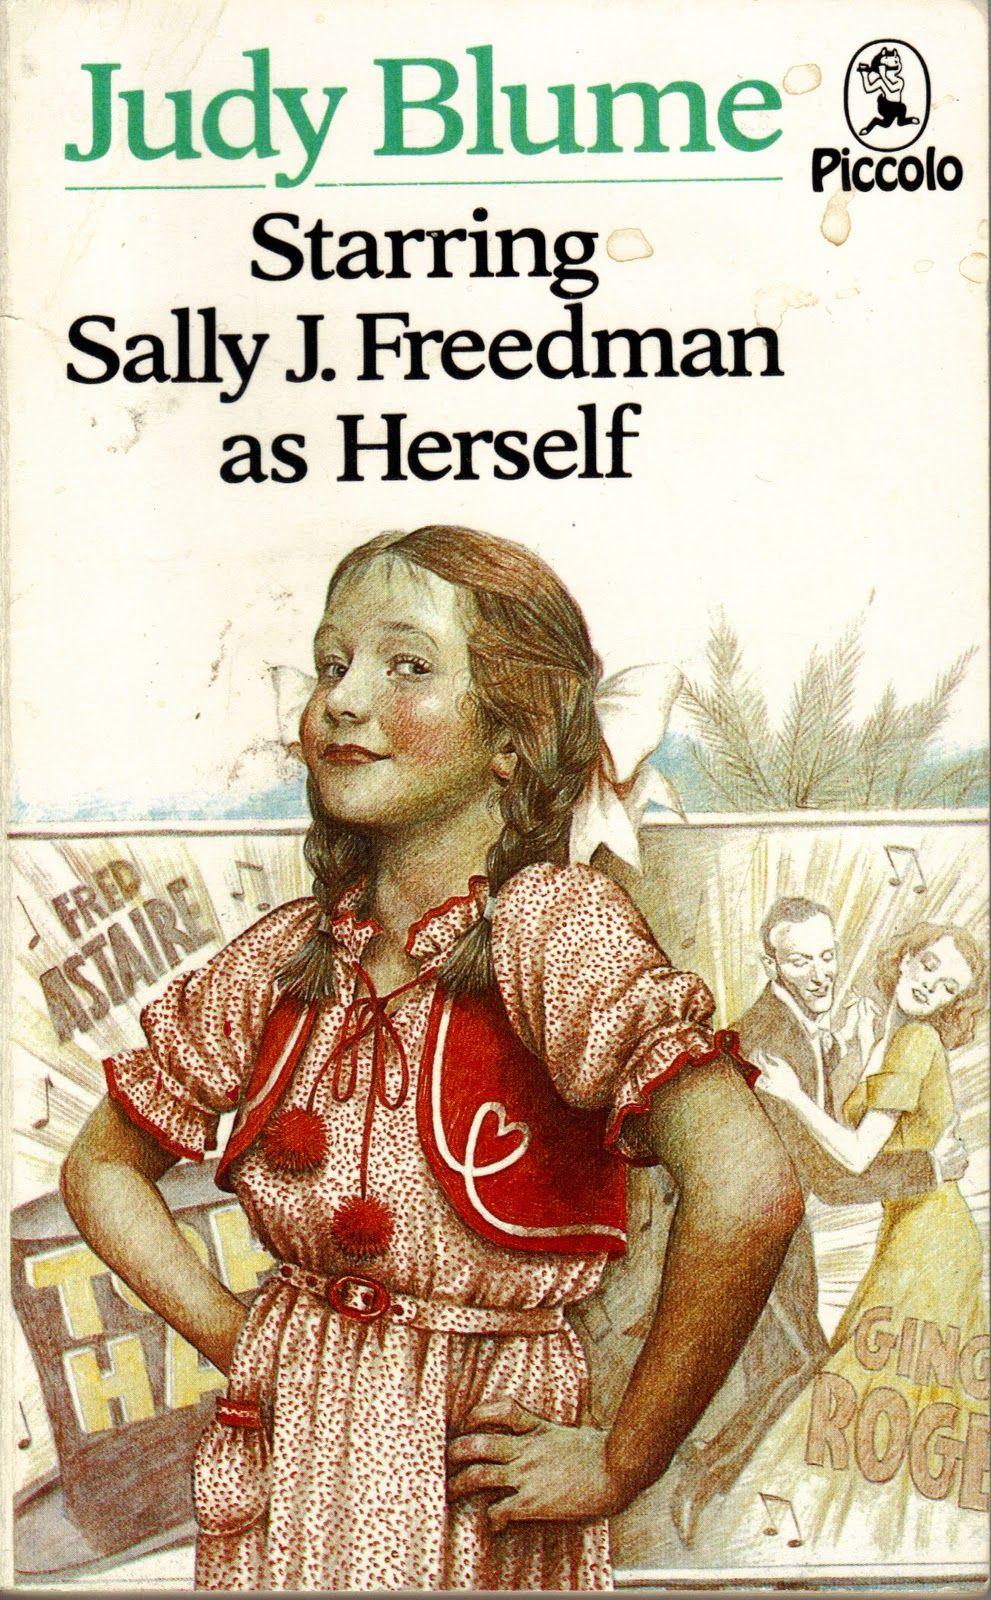 Freedman as Herself Starring Sally J